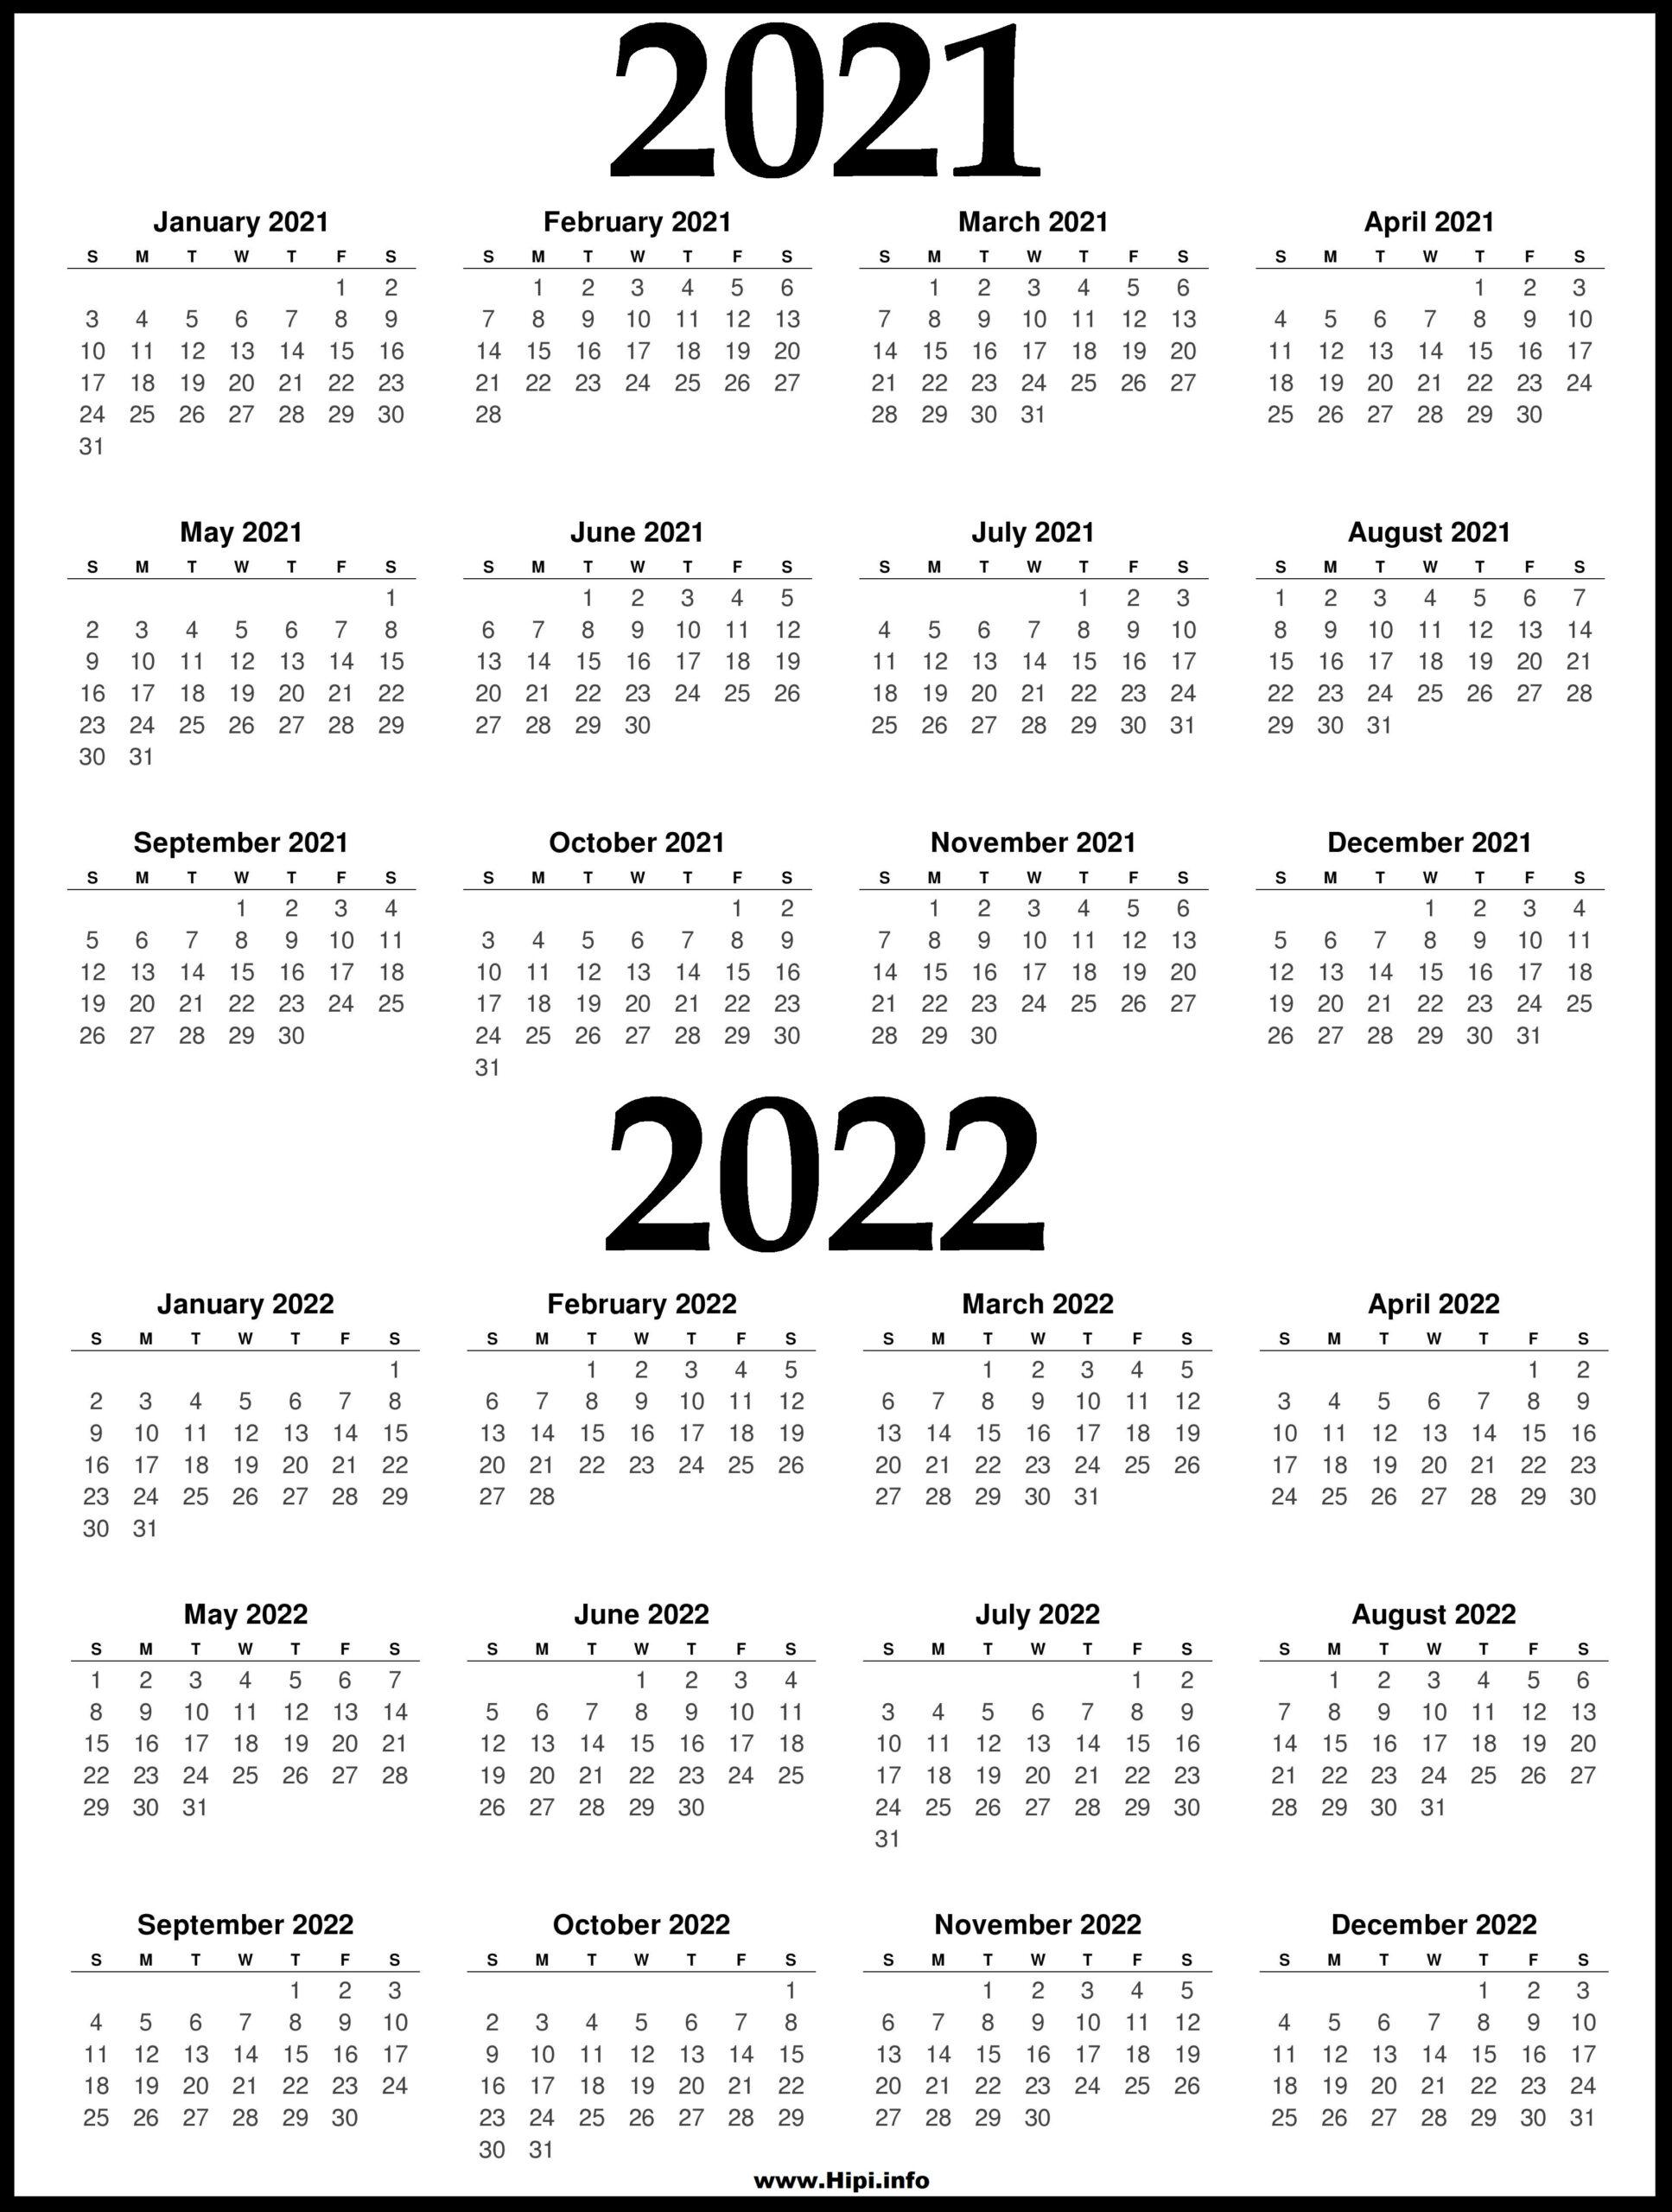 2021 And 2022 Printable Calendar - 2 Year Calendar - Hipi